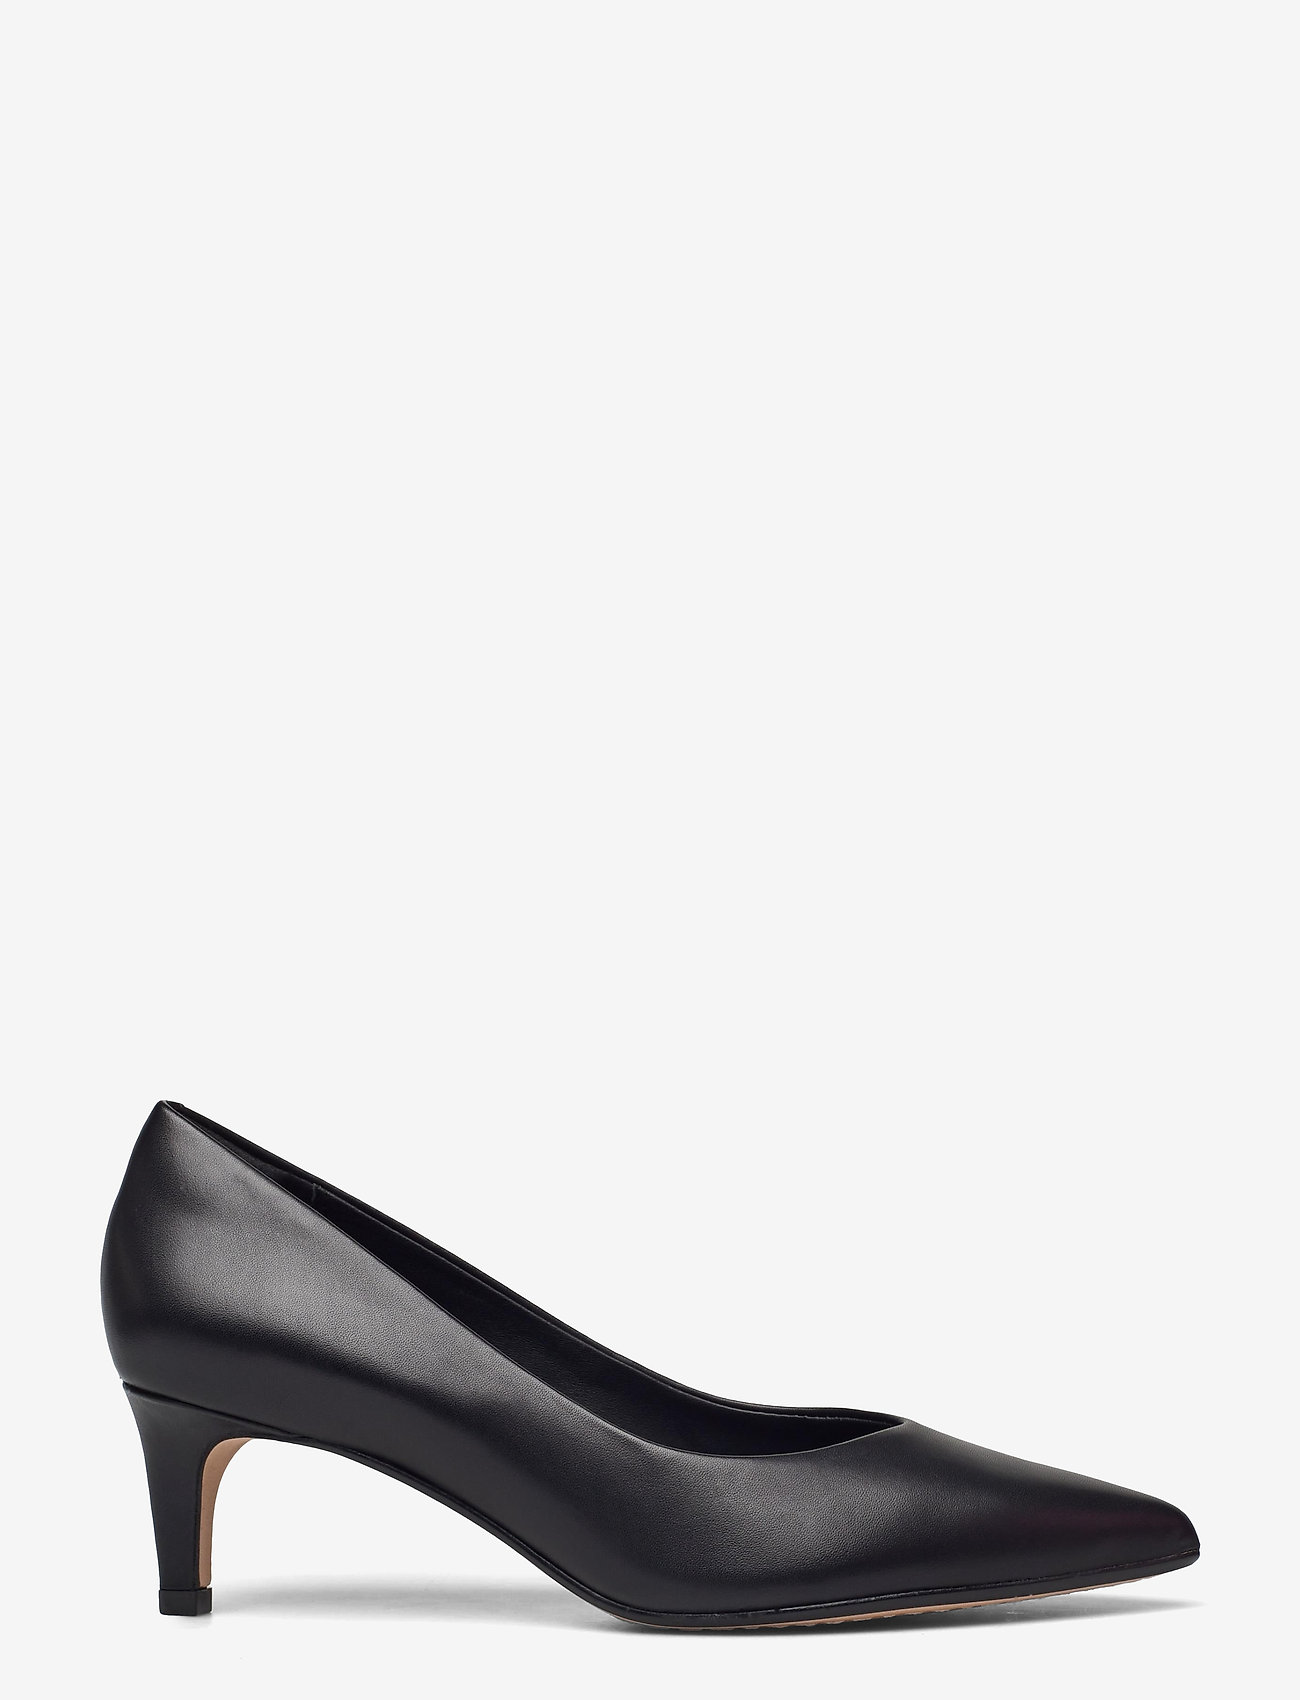 Clarks - Laina55 Court2 - klassiska pumps - black leather - 1